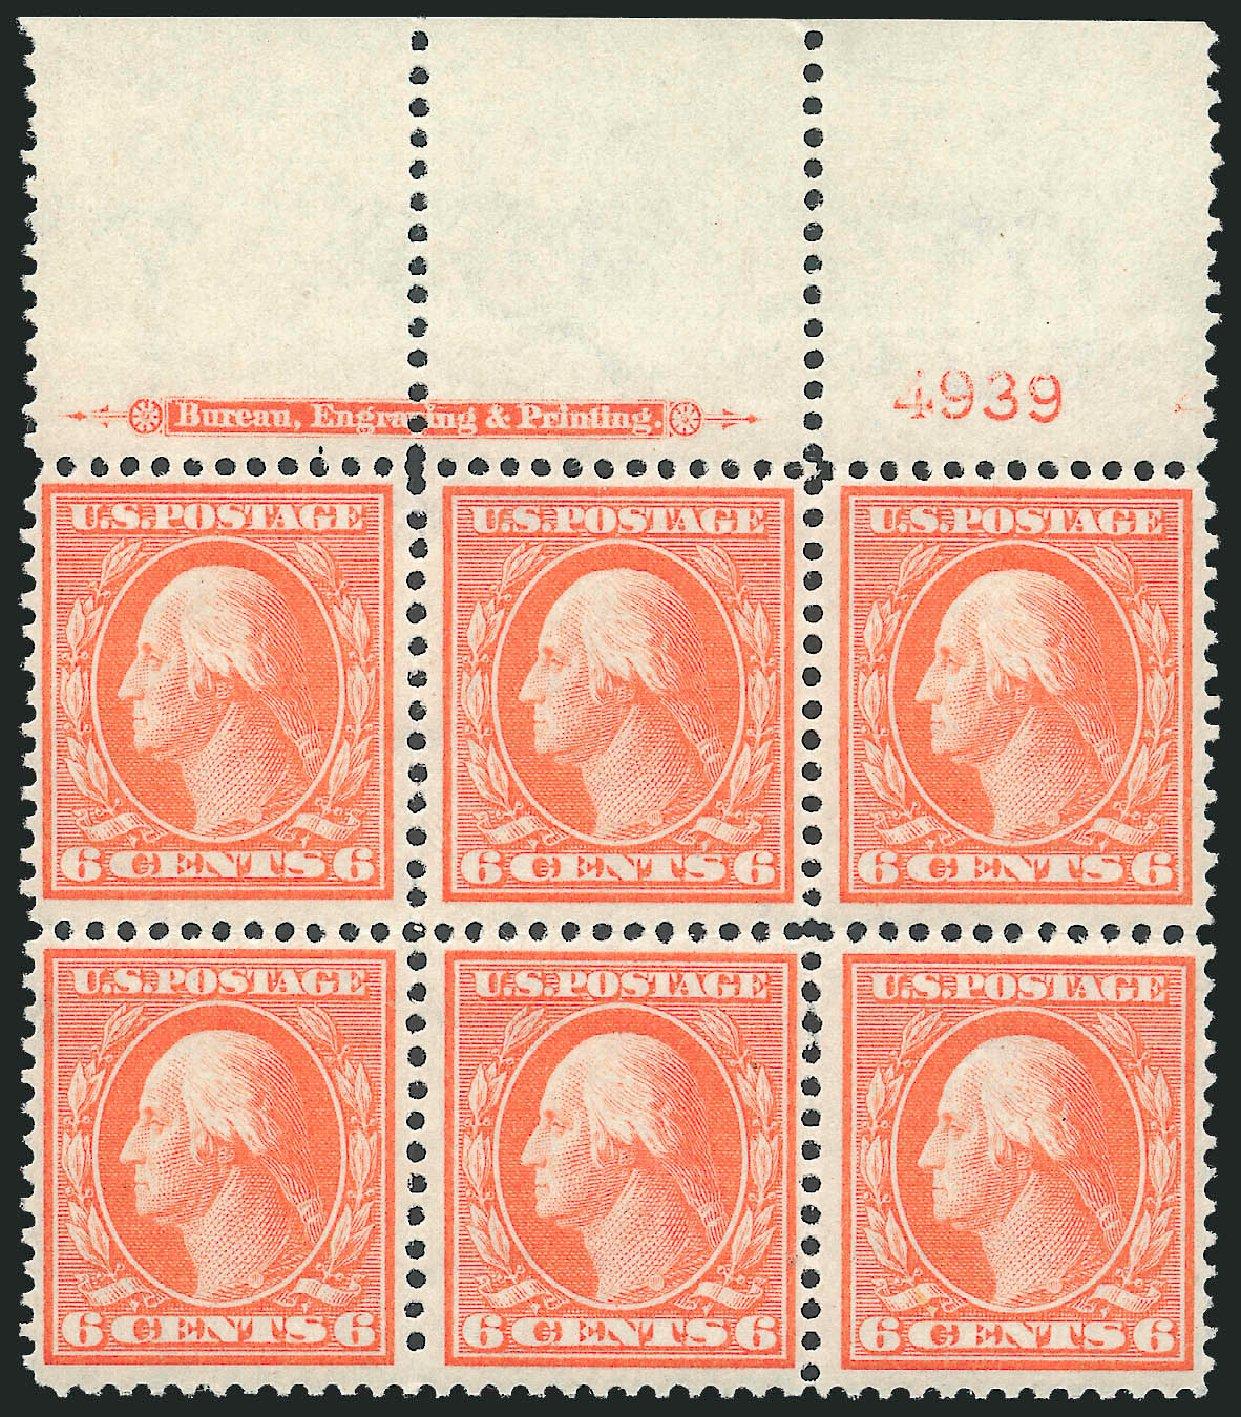 US Stamps Value Scott Catalog 336 - 1909 6c Washington. Robert Siegel Auction Galleries, Oct 2011, Sale 1014, Lot 1771